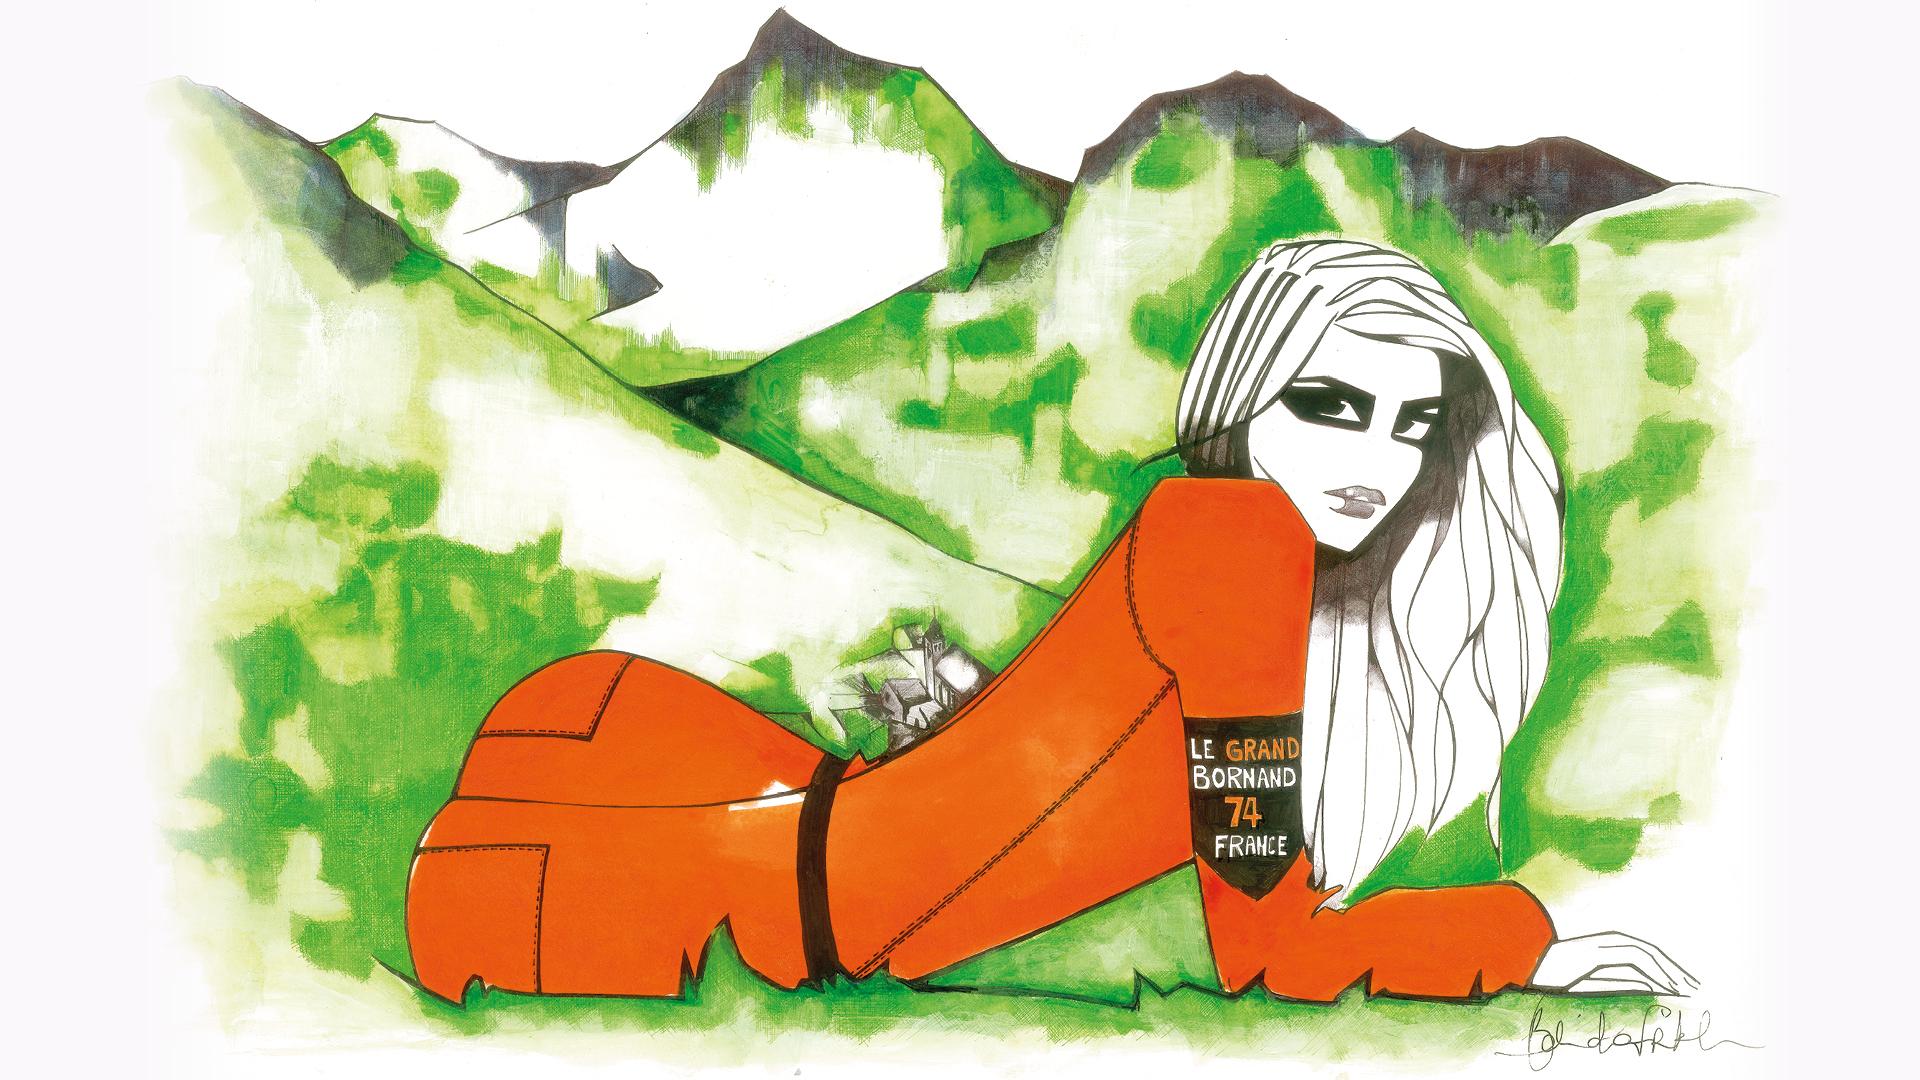 Oeuvre originale de Belinda Frikh pour le Grand-Bornand